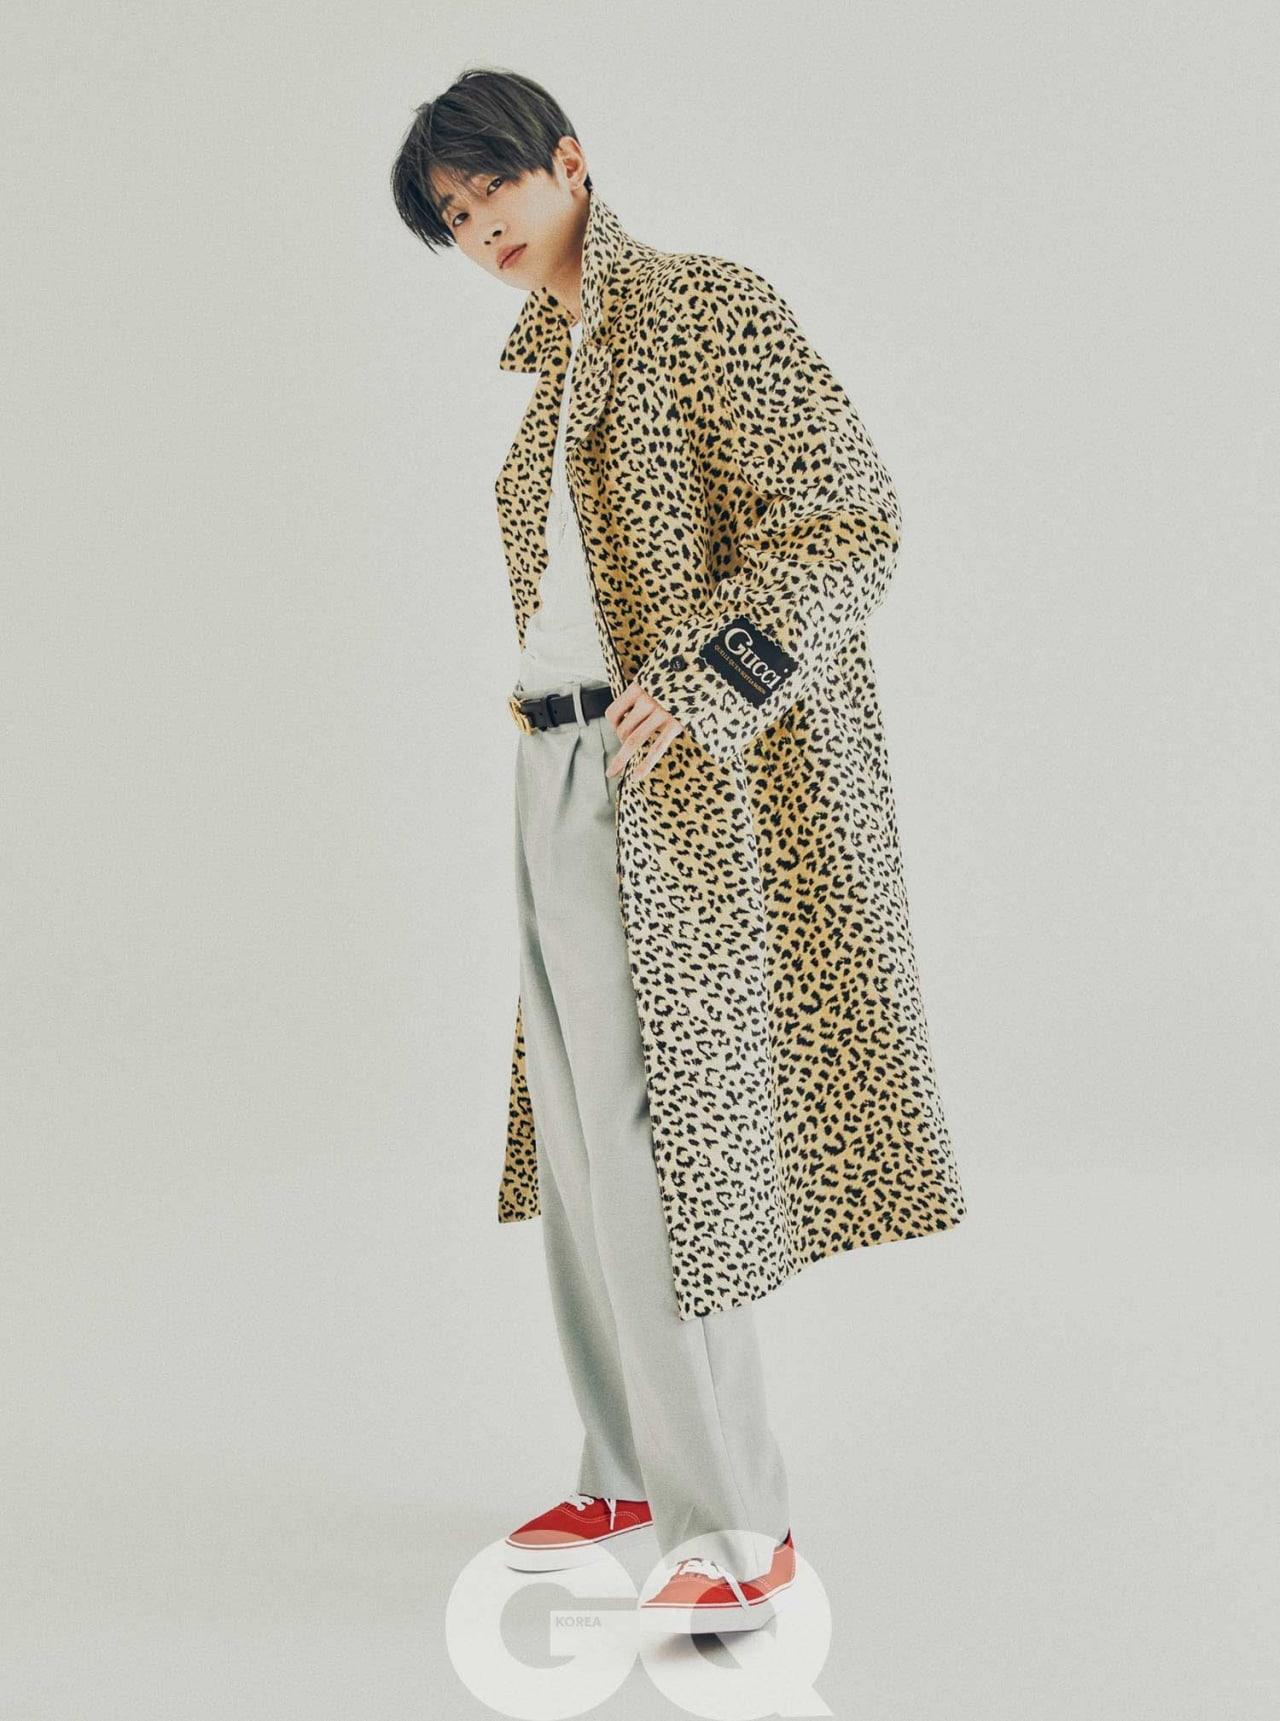 Han Seung Woo 2